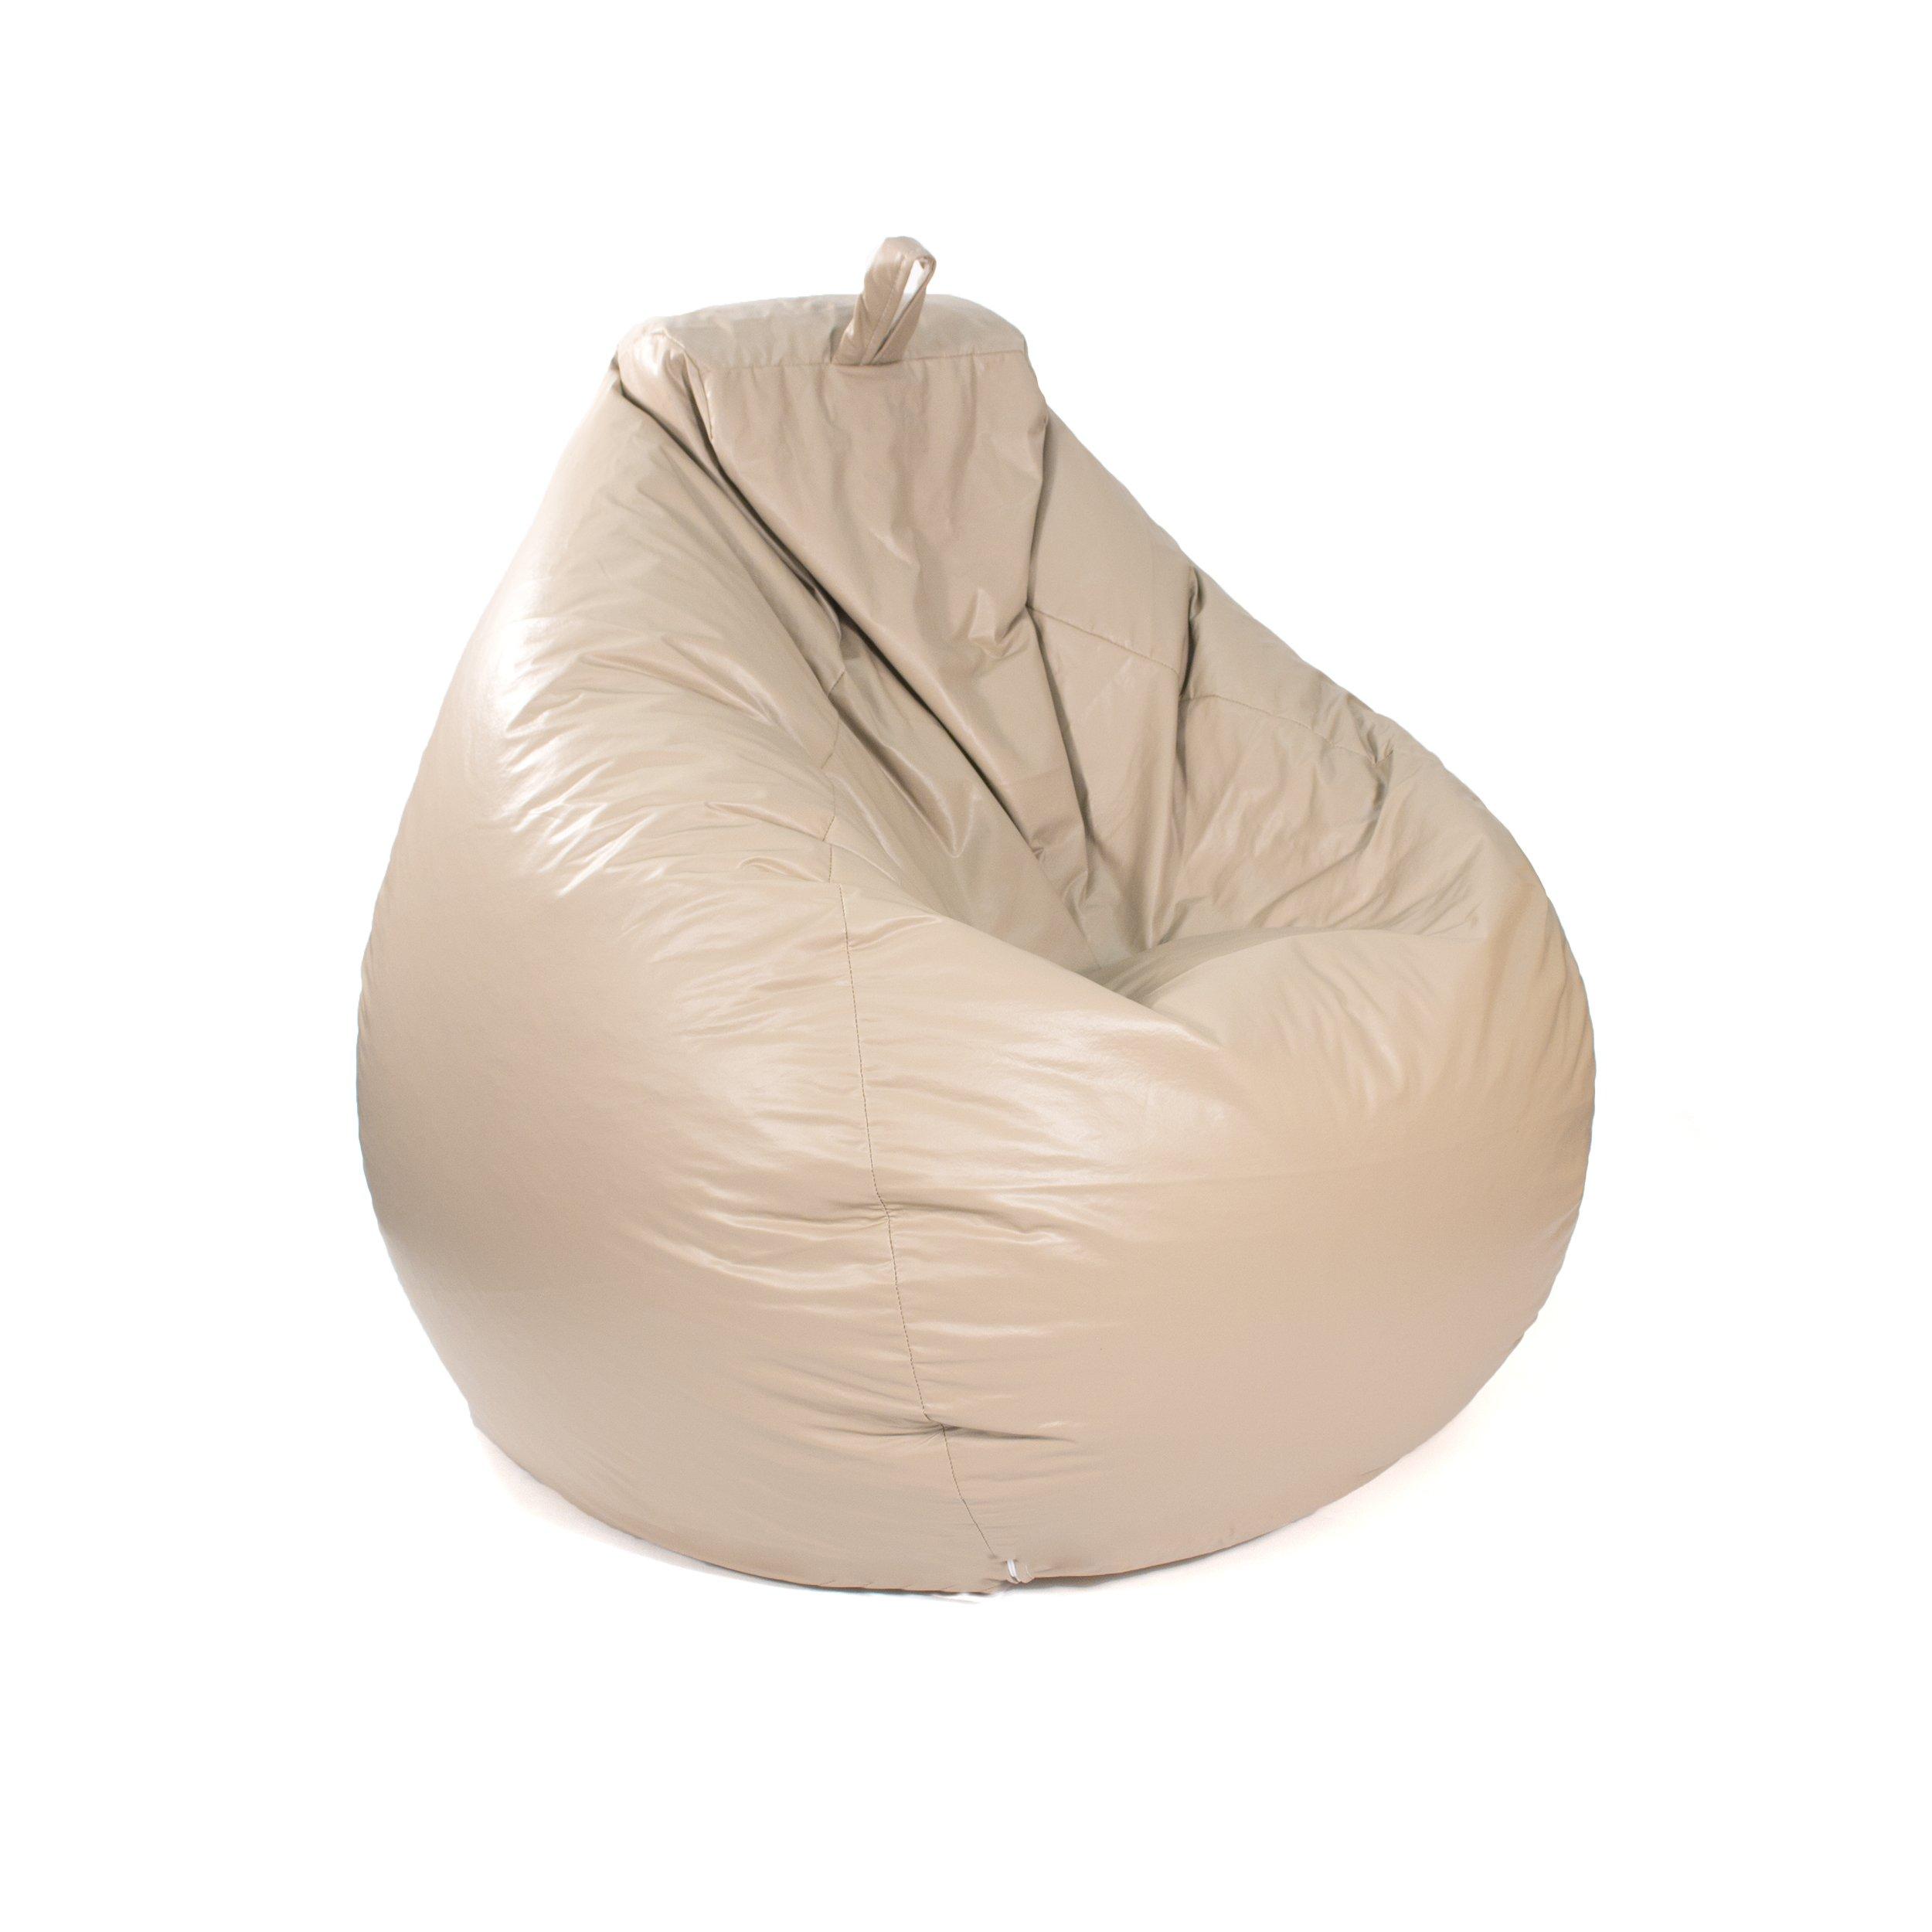 Gold Medal Bean Bags Tear Drop Leather Look Vinyl Bean Bag, Large, Cobblestone